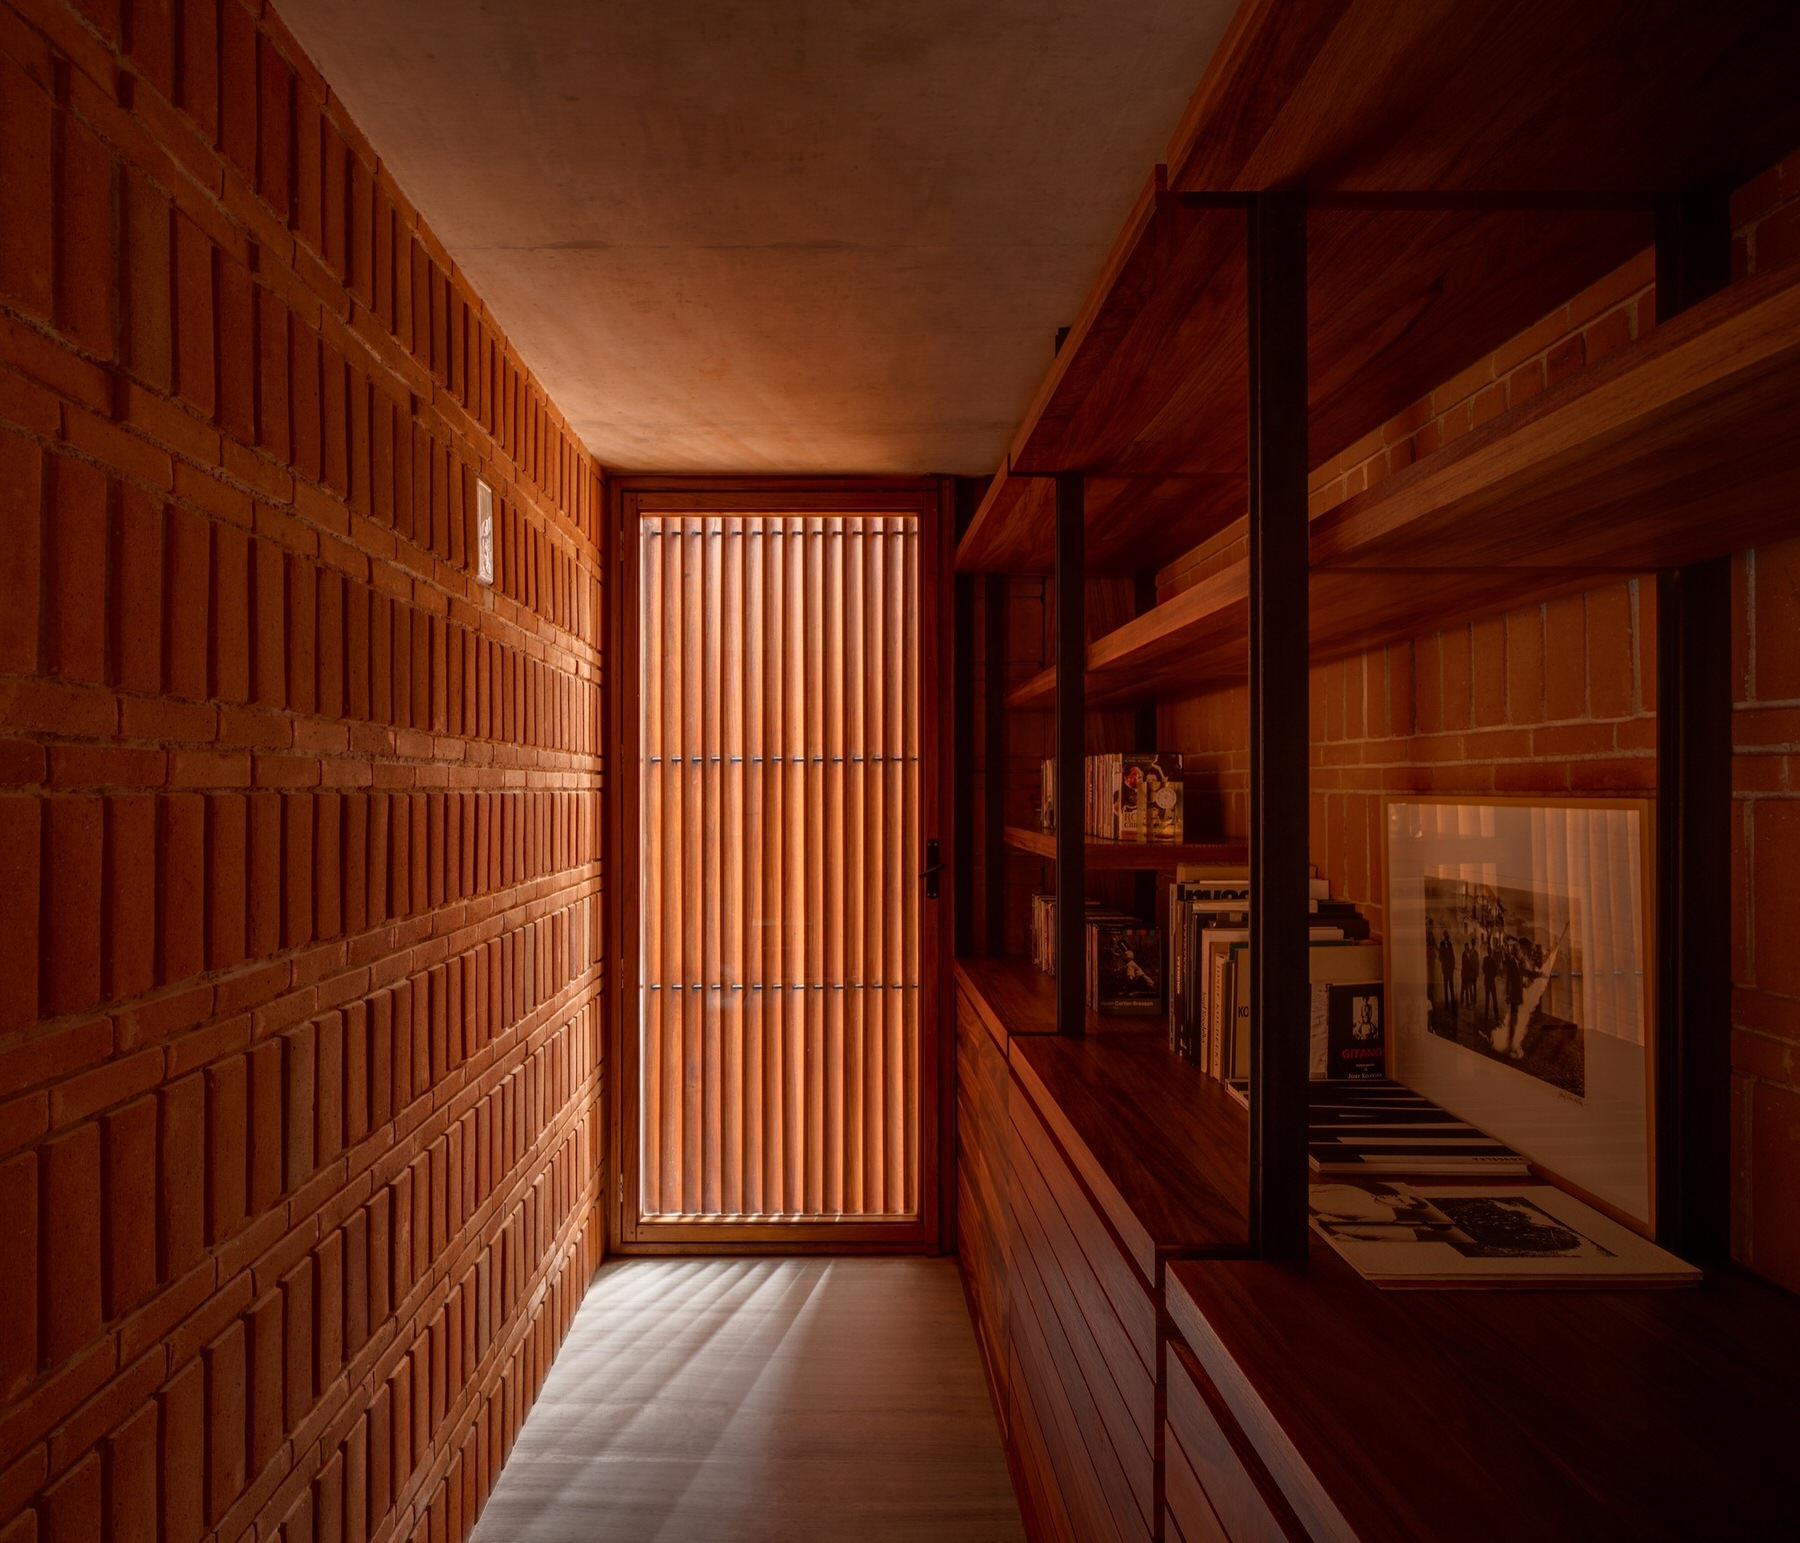 Iturbide Studio Mexico City Brick Architecture Taller Mauricio Rocha Gabriela Carrillo Yellowtrace 13